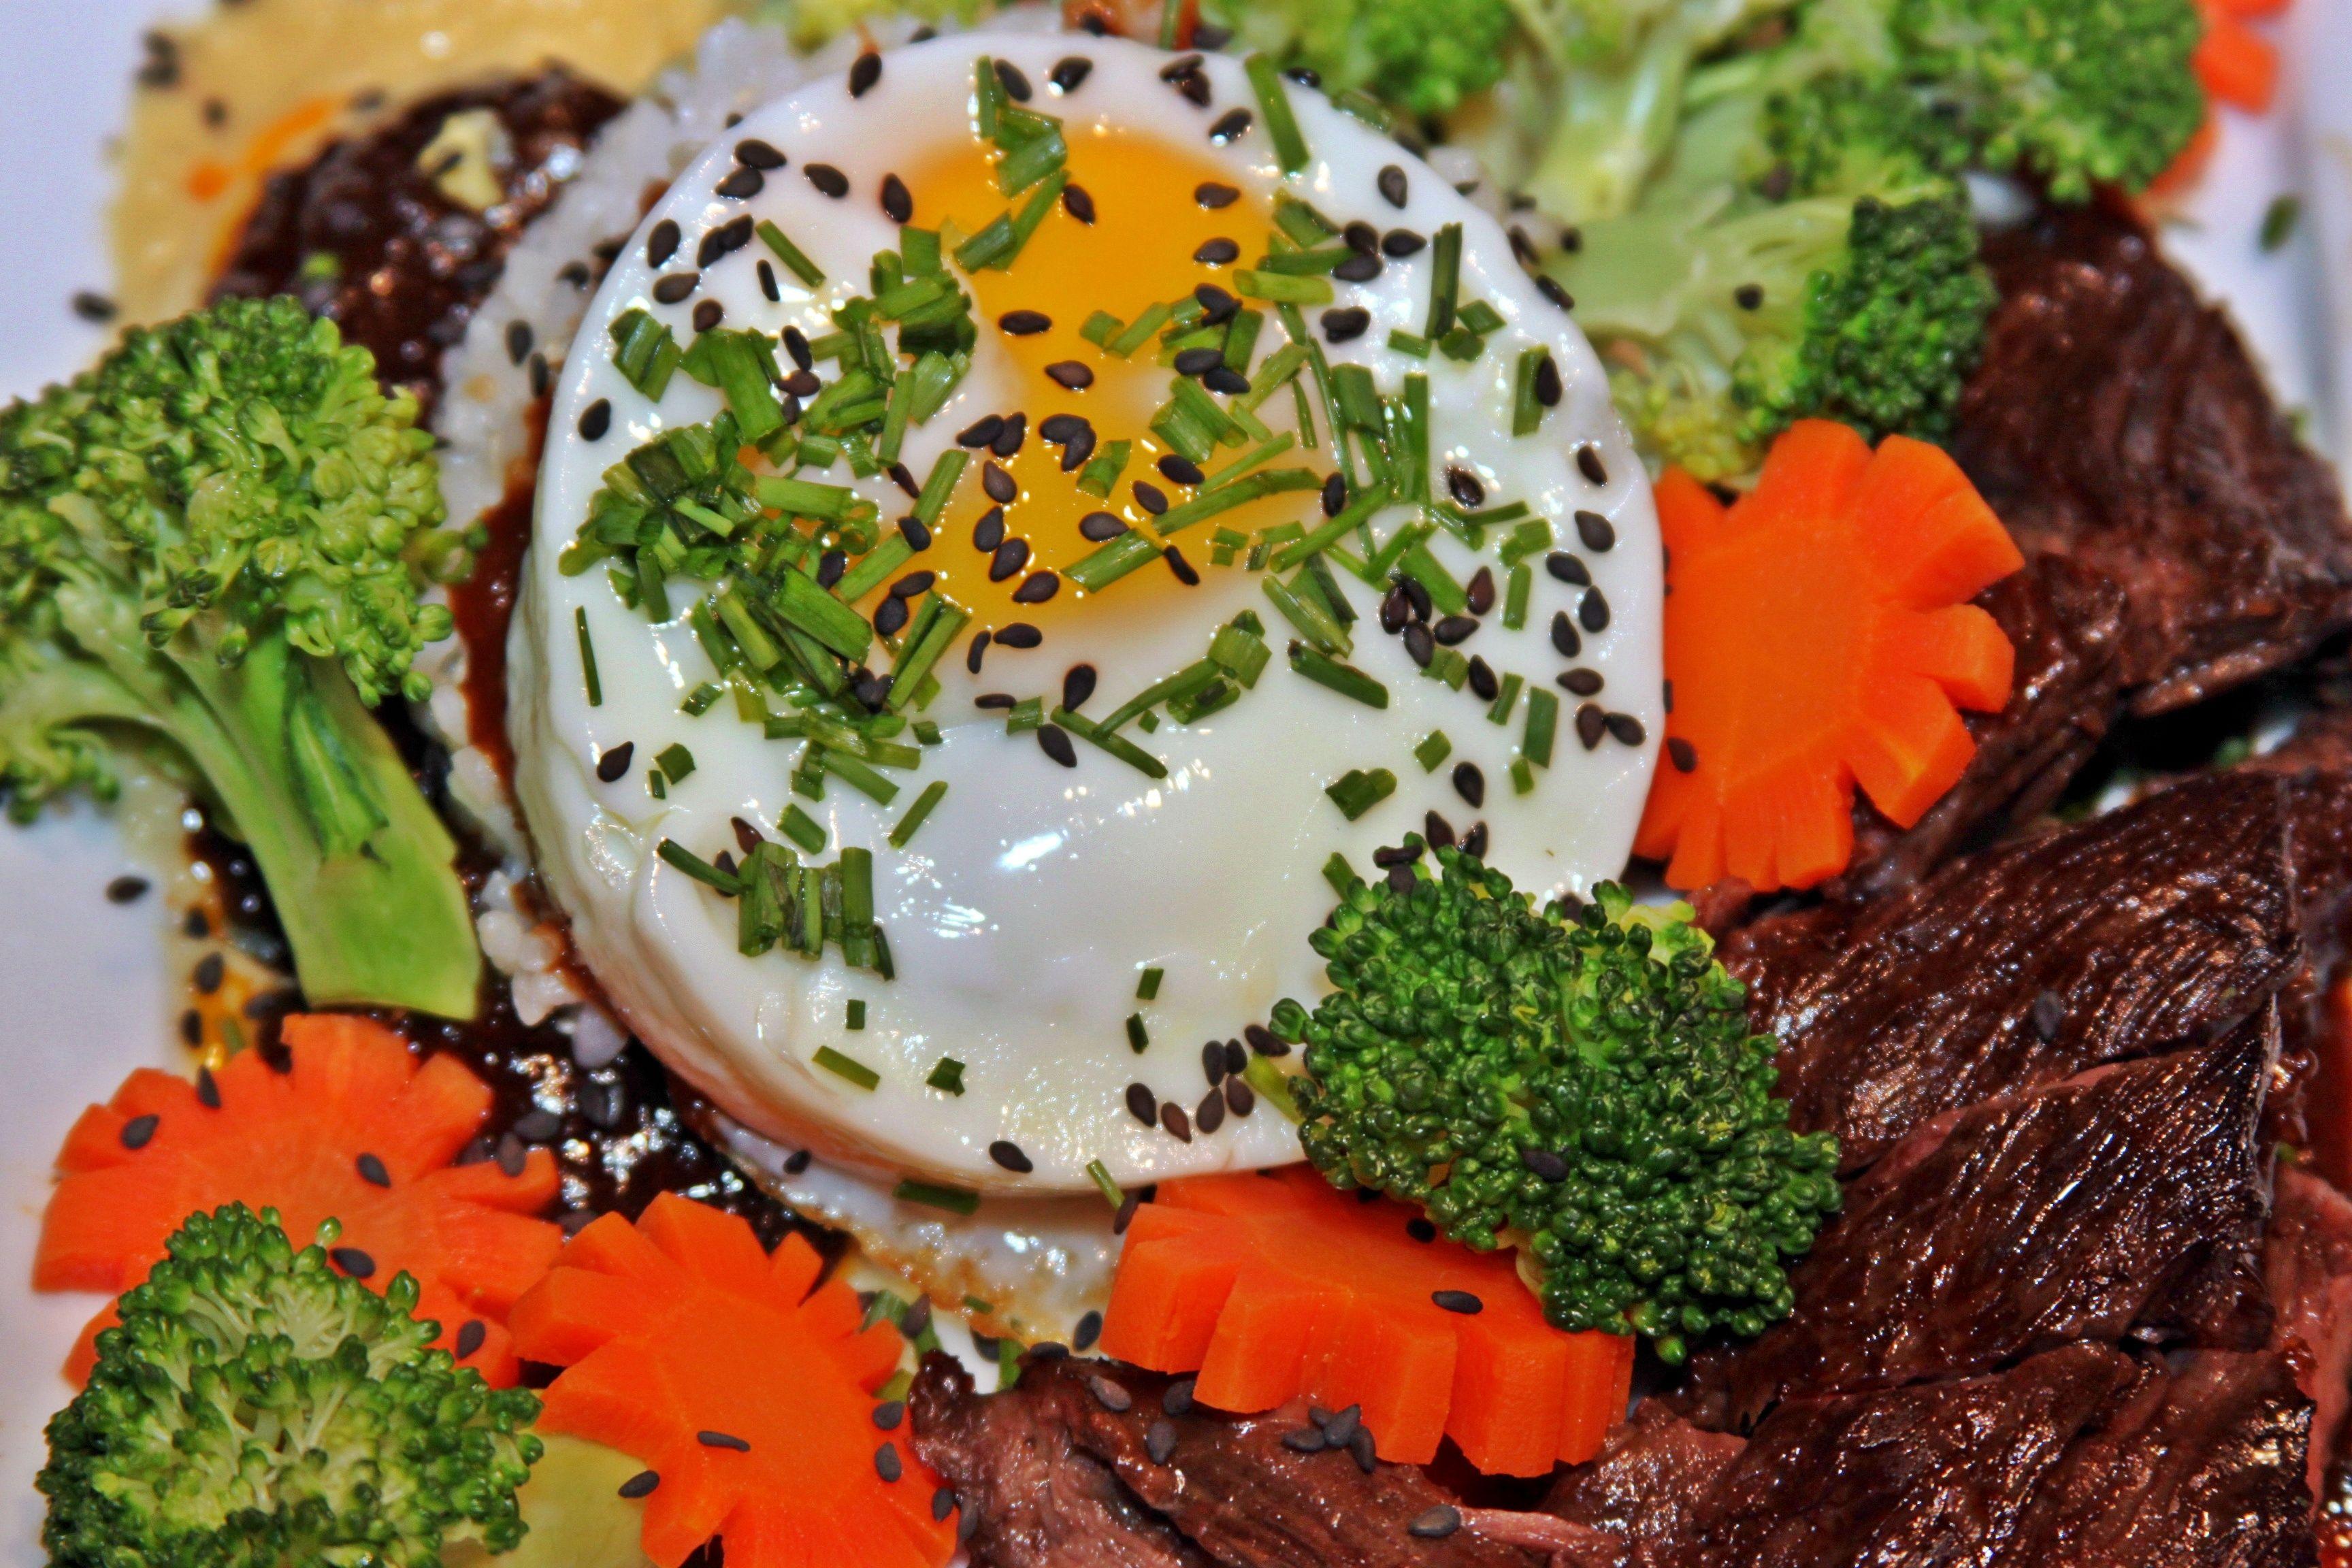 Beef & broccoli with fried rice. www.westchesterfoodie.com